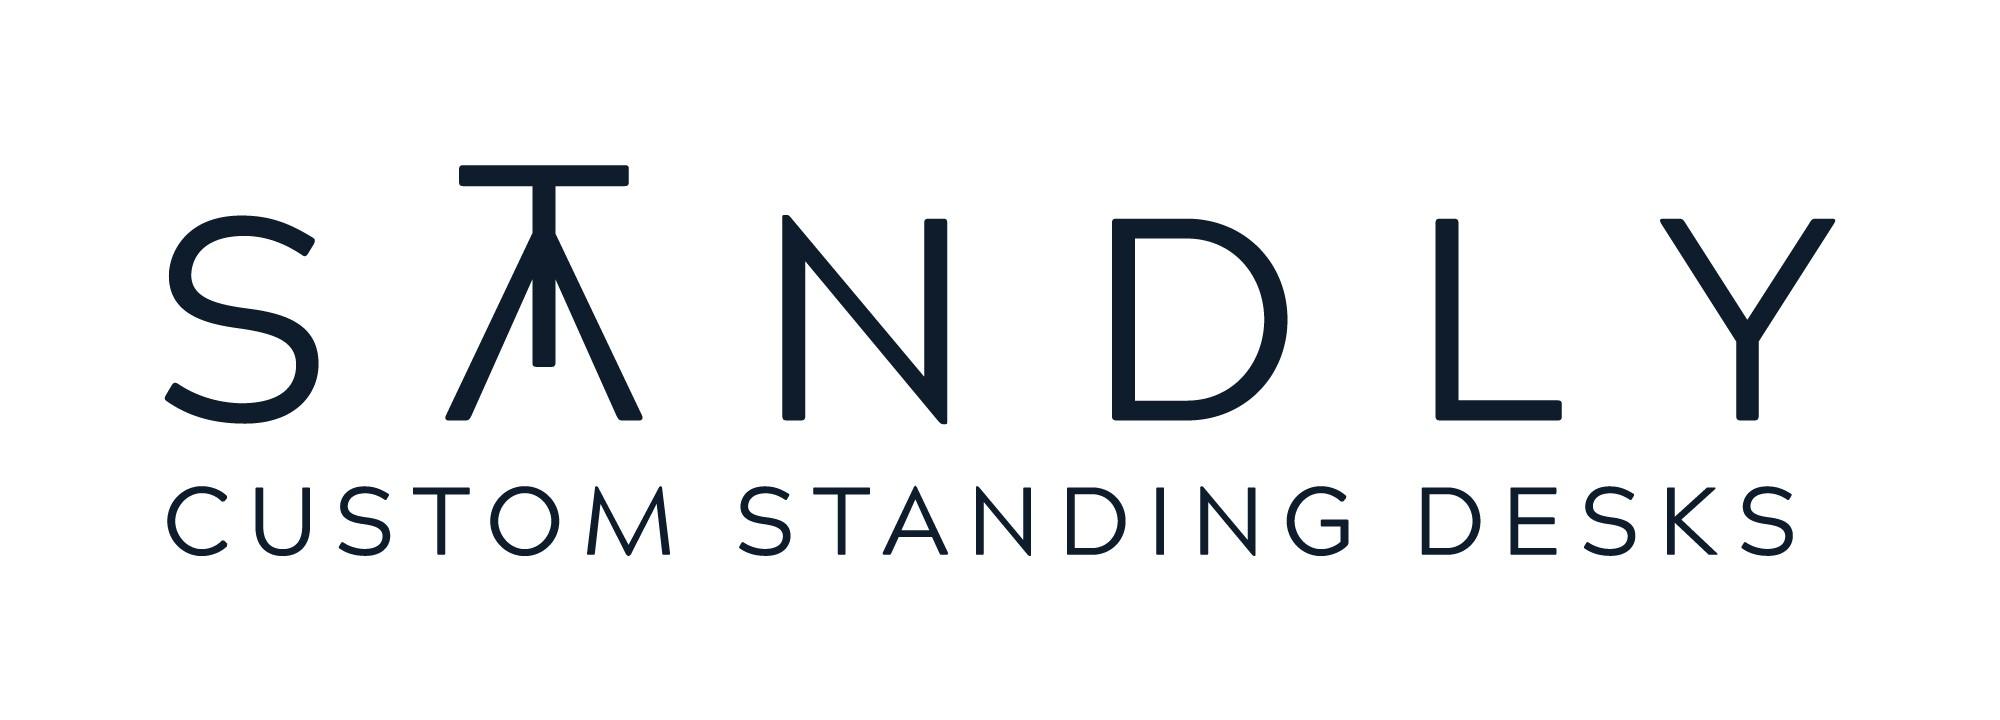 Logo for portable, height-adjustable standing desk